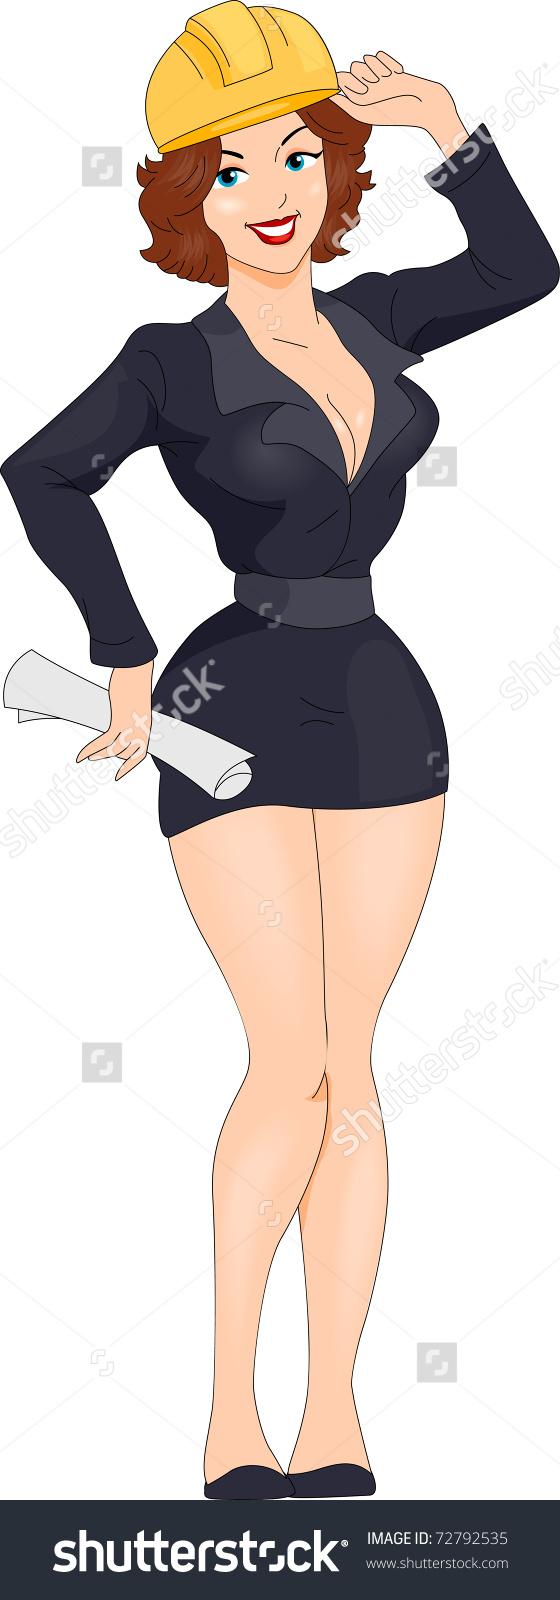 Illustration Pinup Girl Dressed Like Engineer Stock Vector.